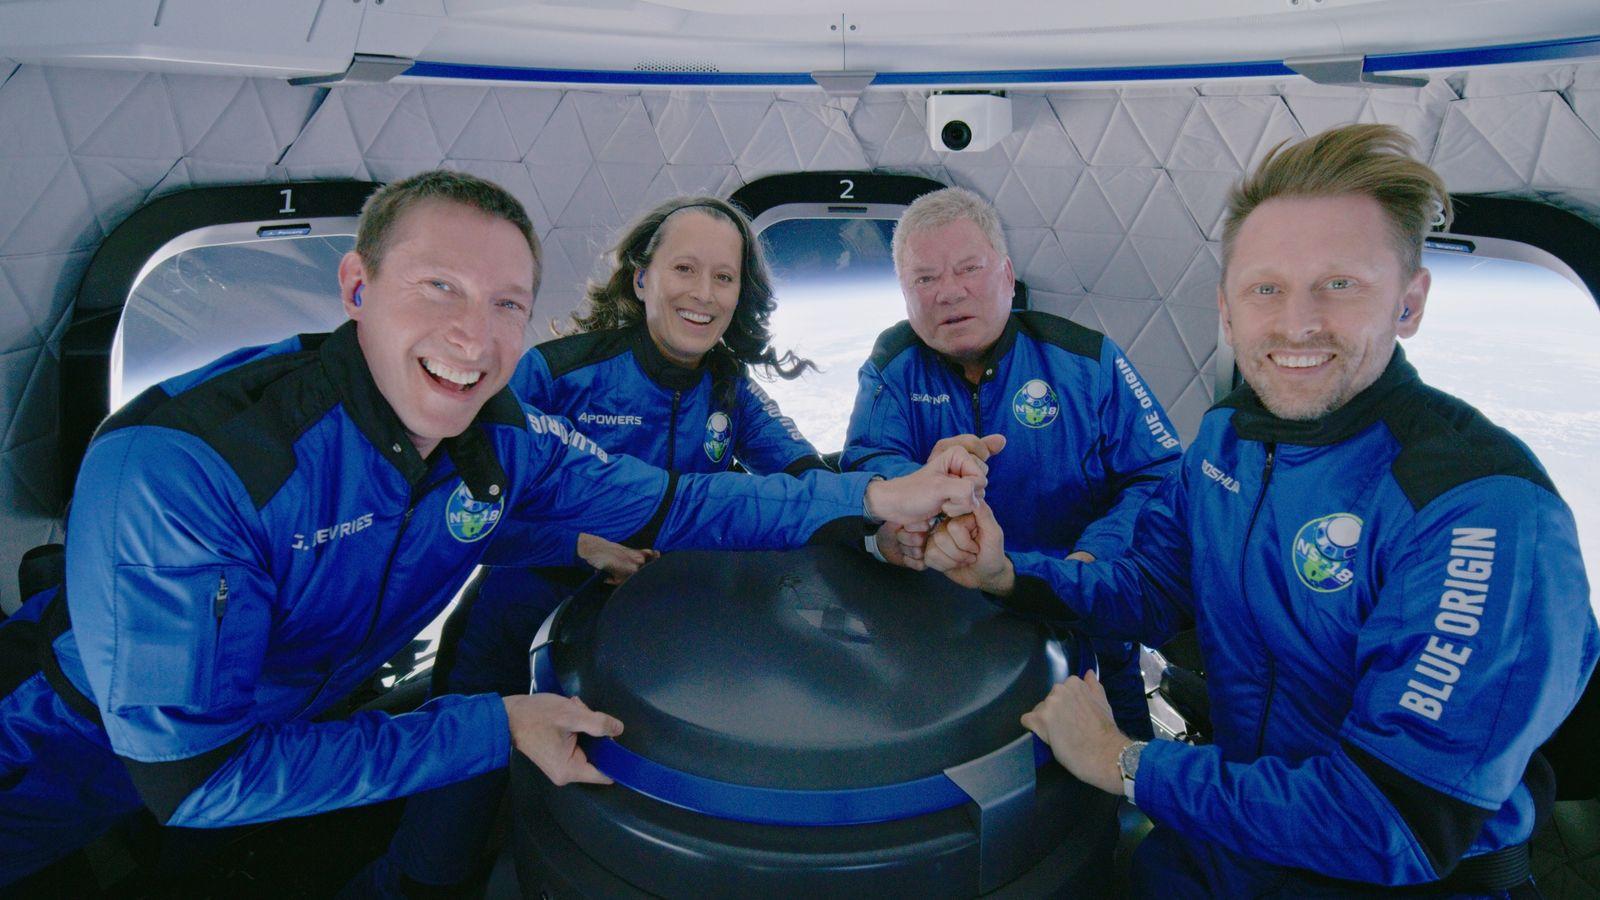 Star Trek actor William Shatner during the Blue Origin New Shepard mission NS-18